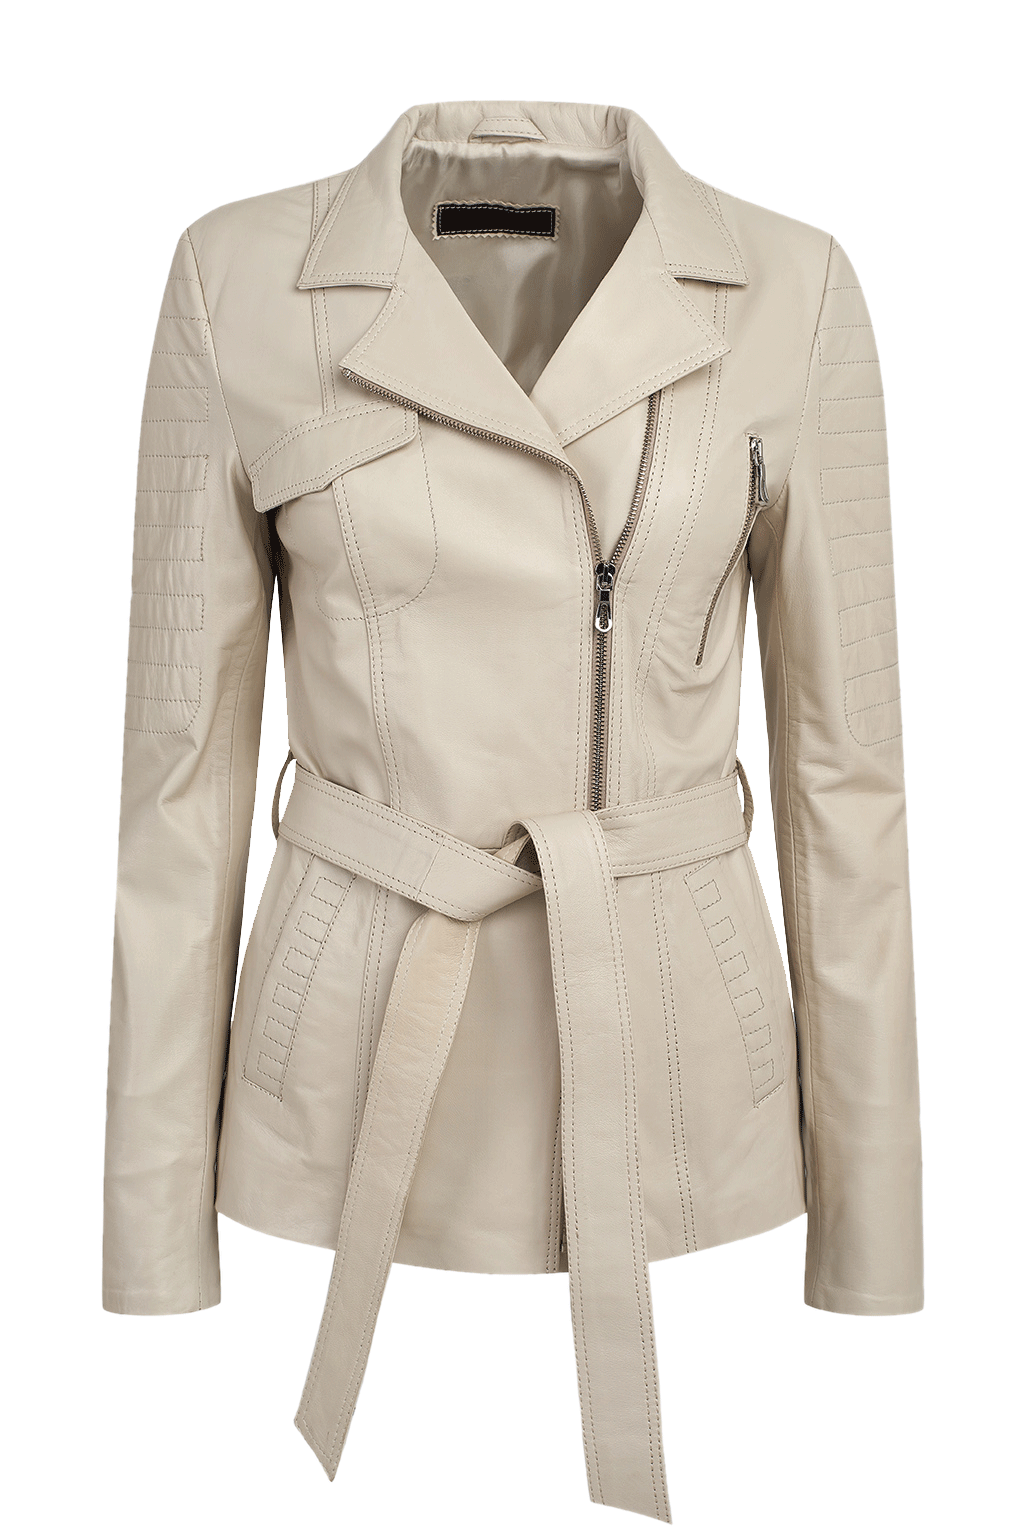 Women's Long Leather Jacket - White